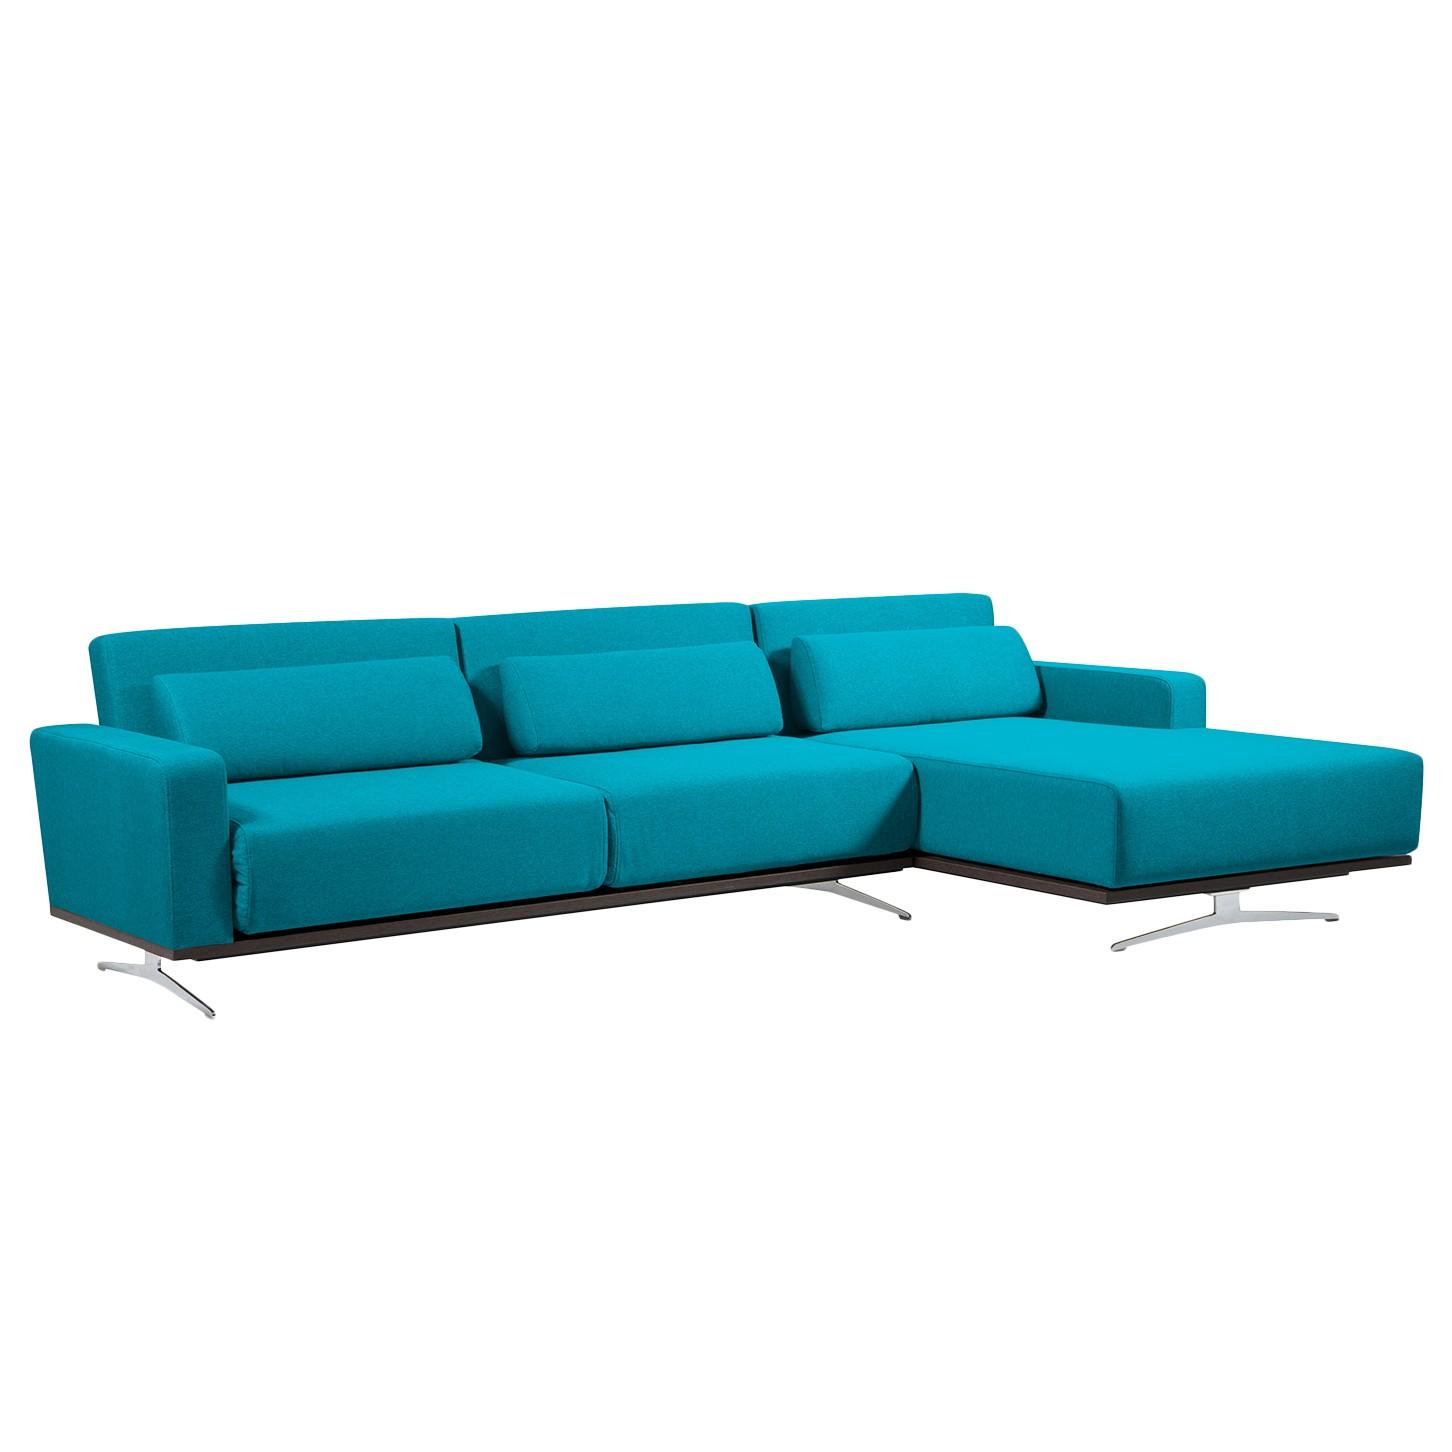 ecksofa mit schlaffunktion t rkis inspirierendes design f r wohnm bel. Black Bedroom Furniture Sets. Home Design Ideas